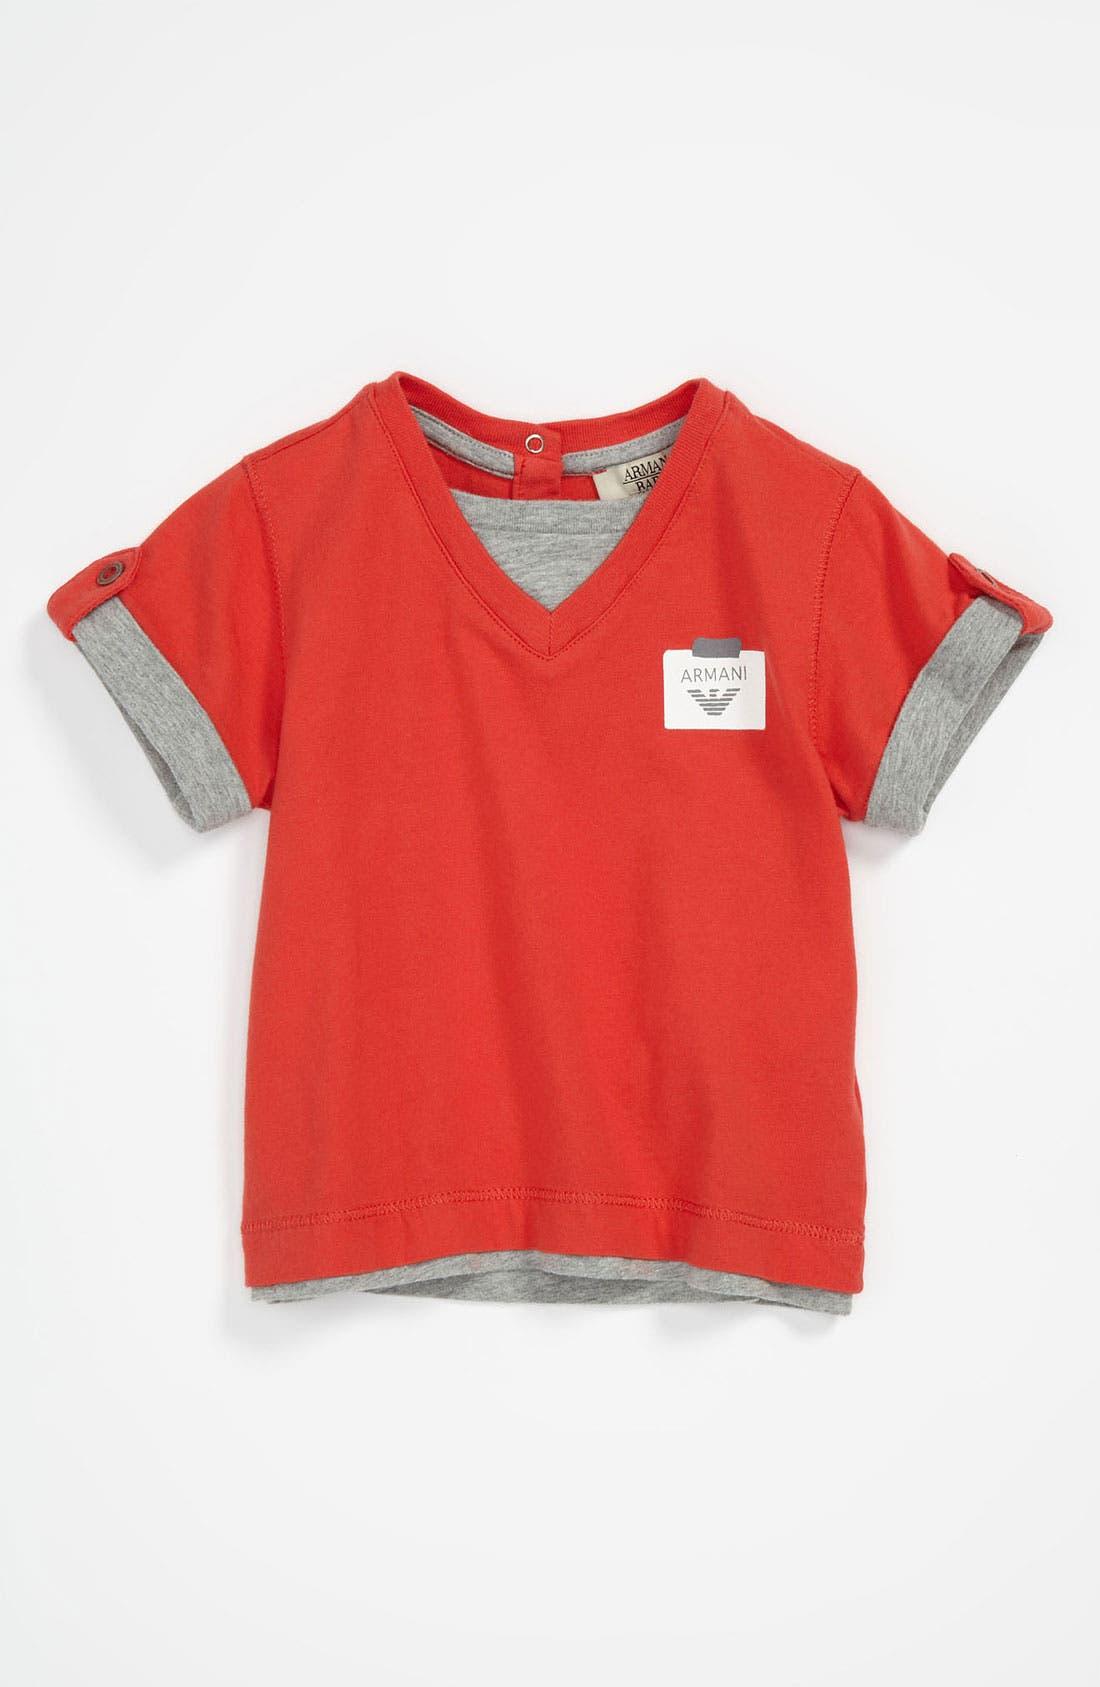 Main Image - Armani Junior T-Shirt (Baby)